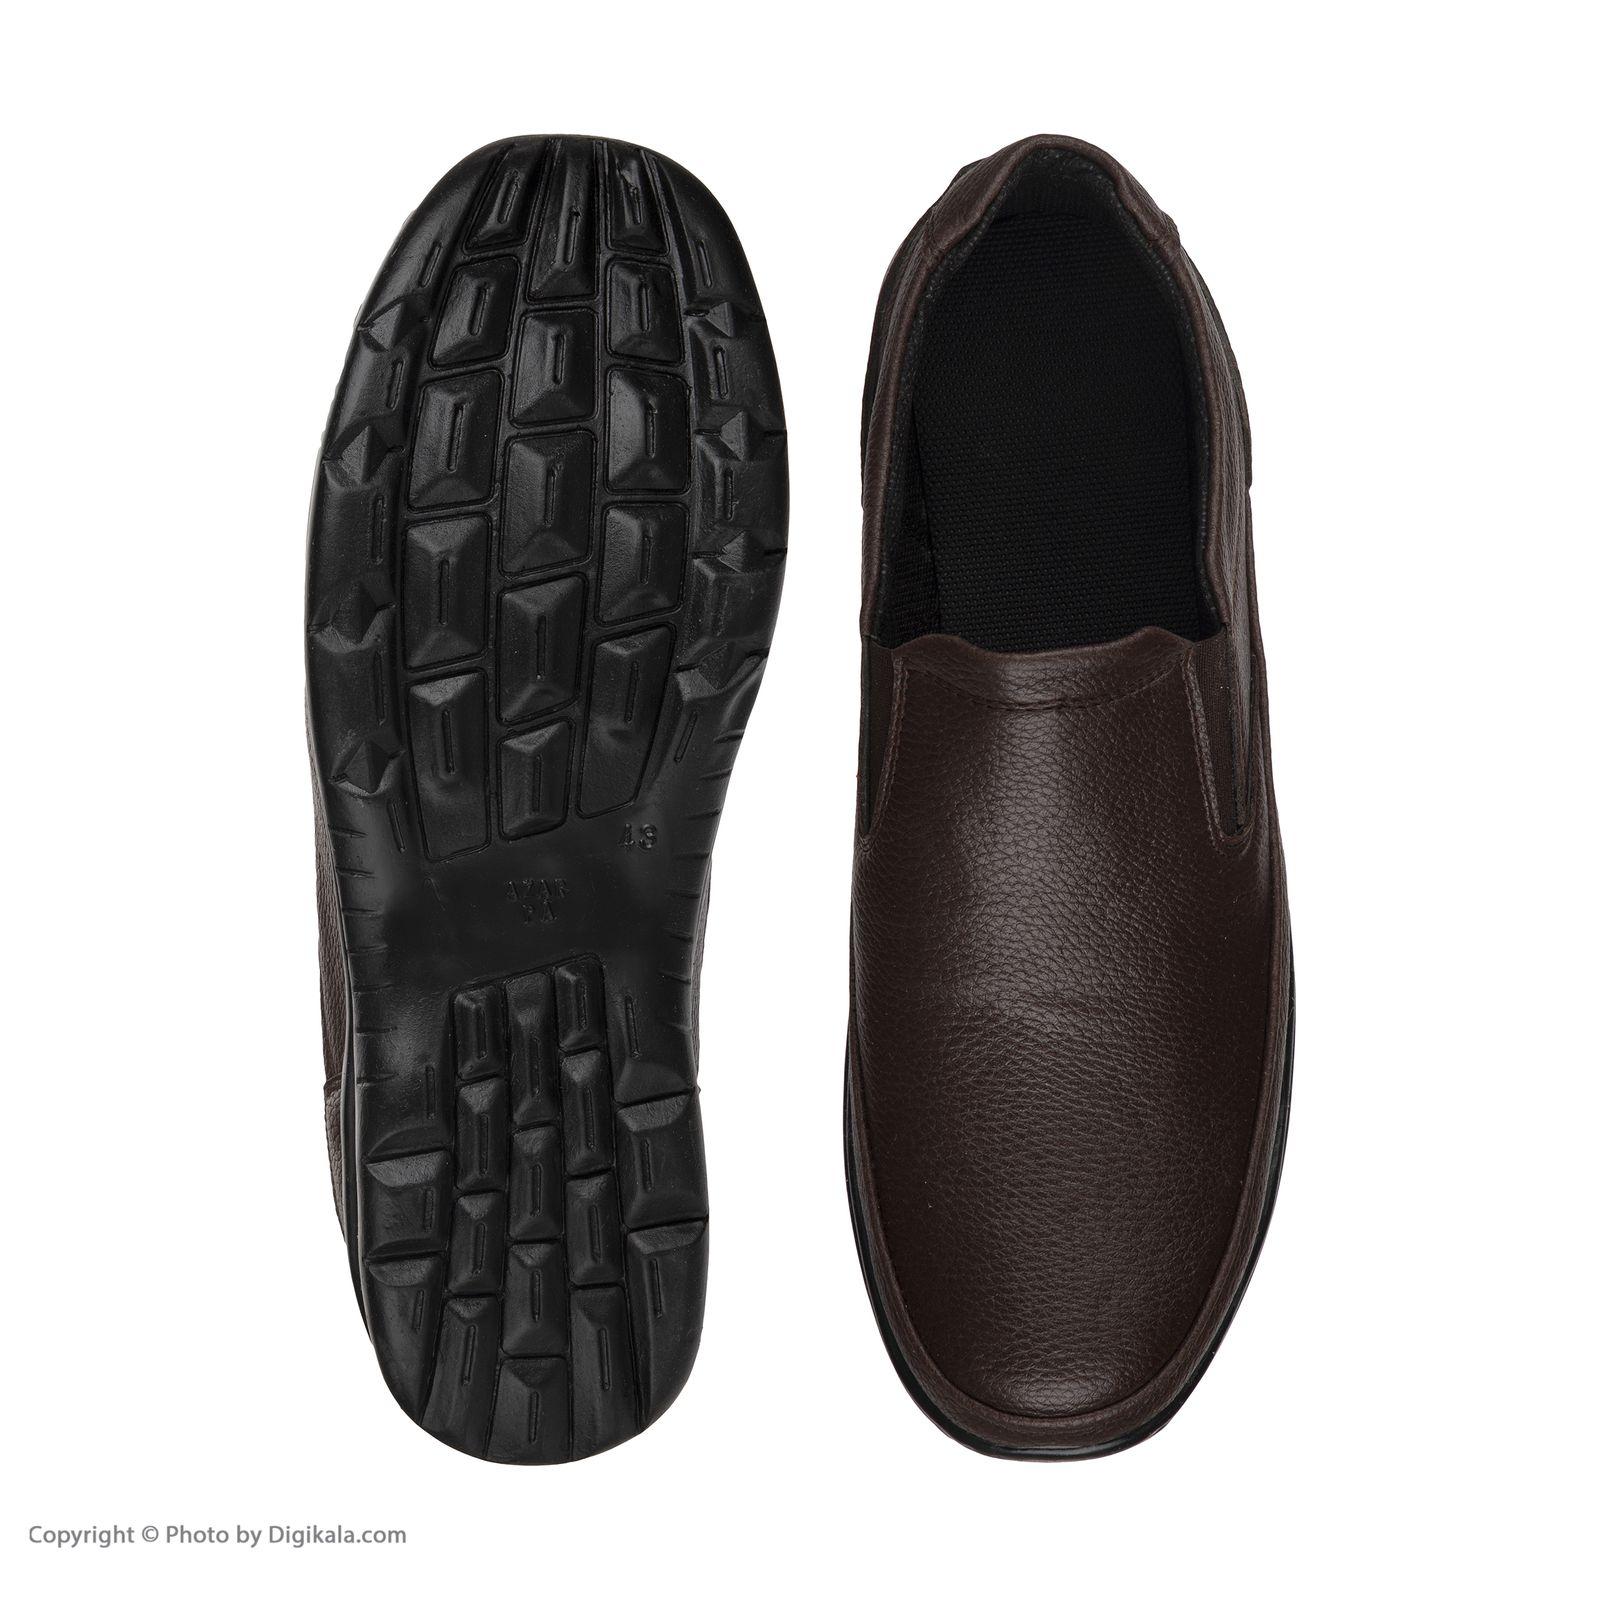 کفش روزمره مردانه مدل k.baz.073 -  - 5